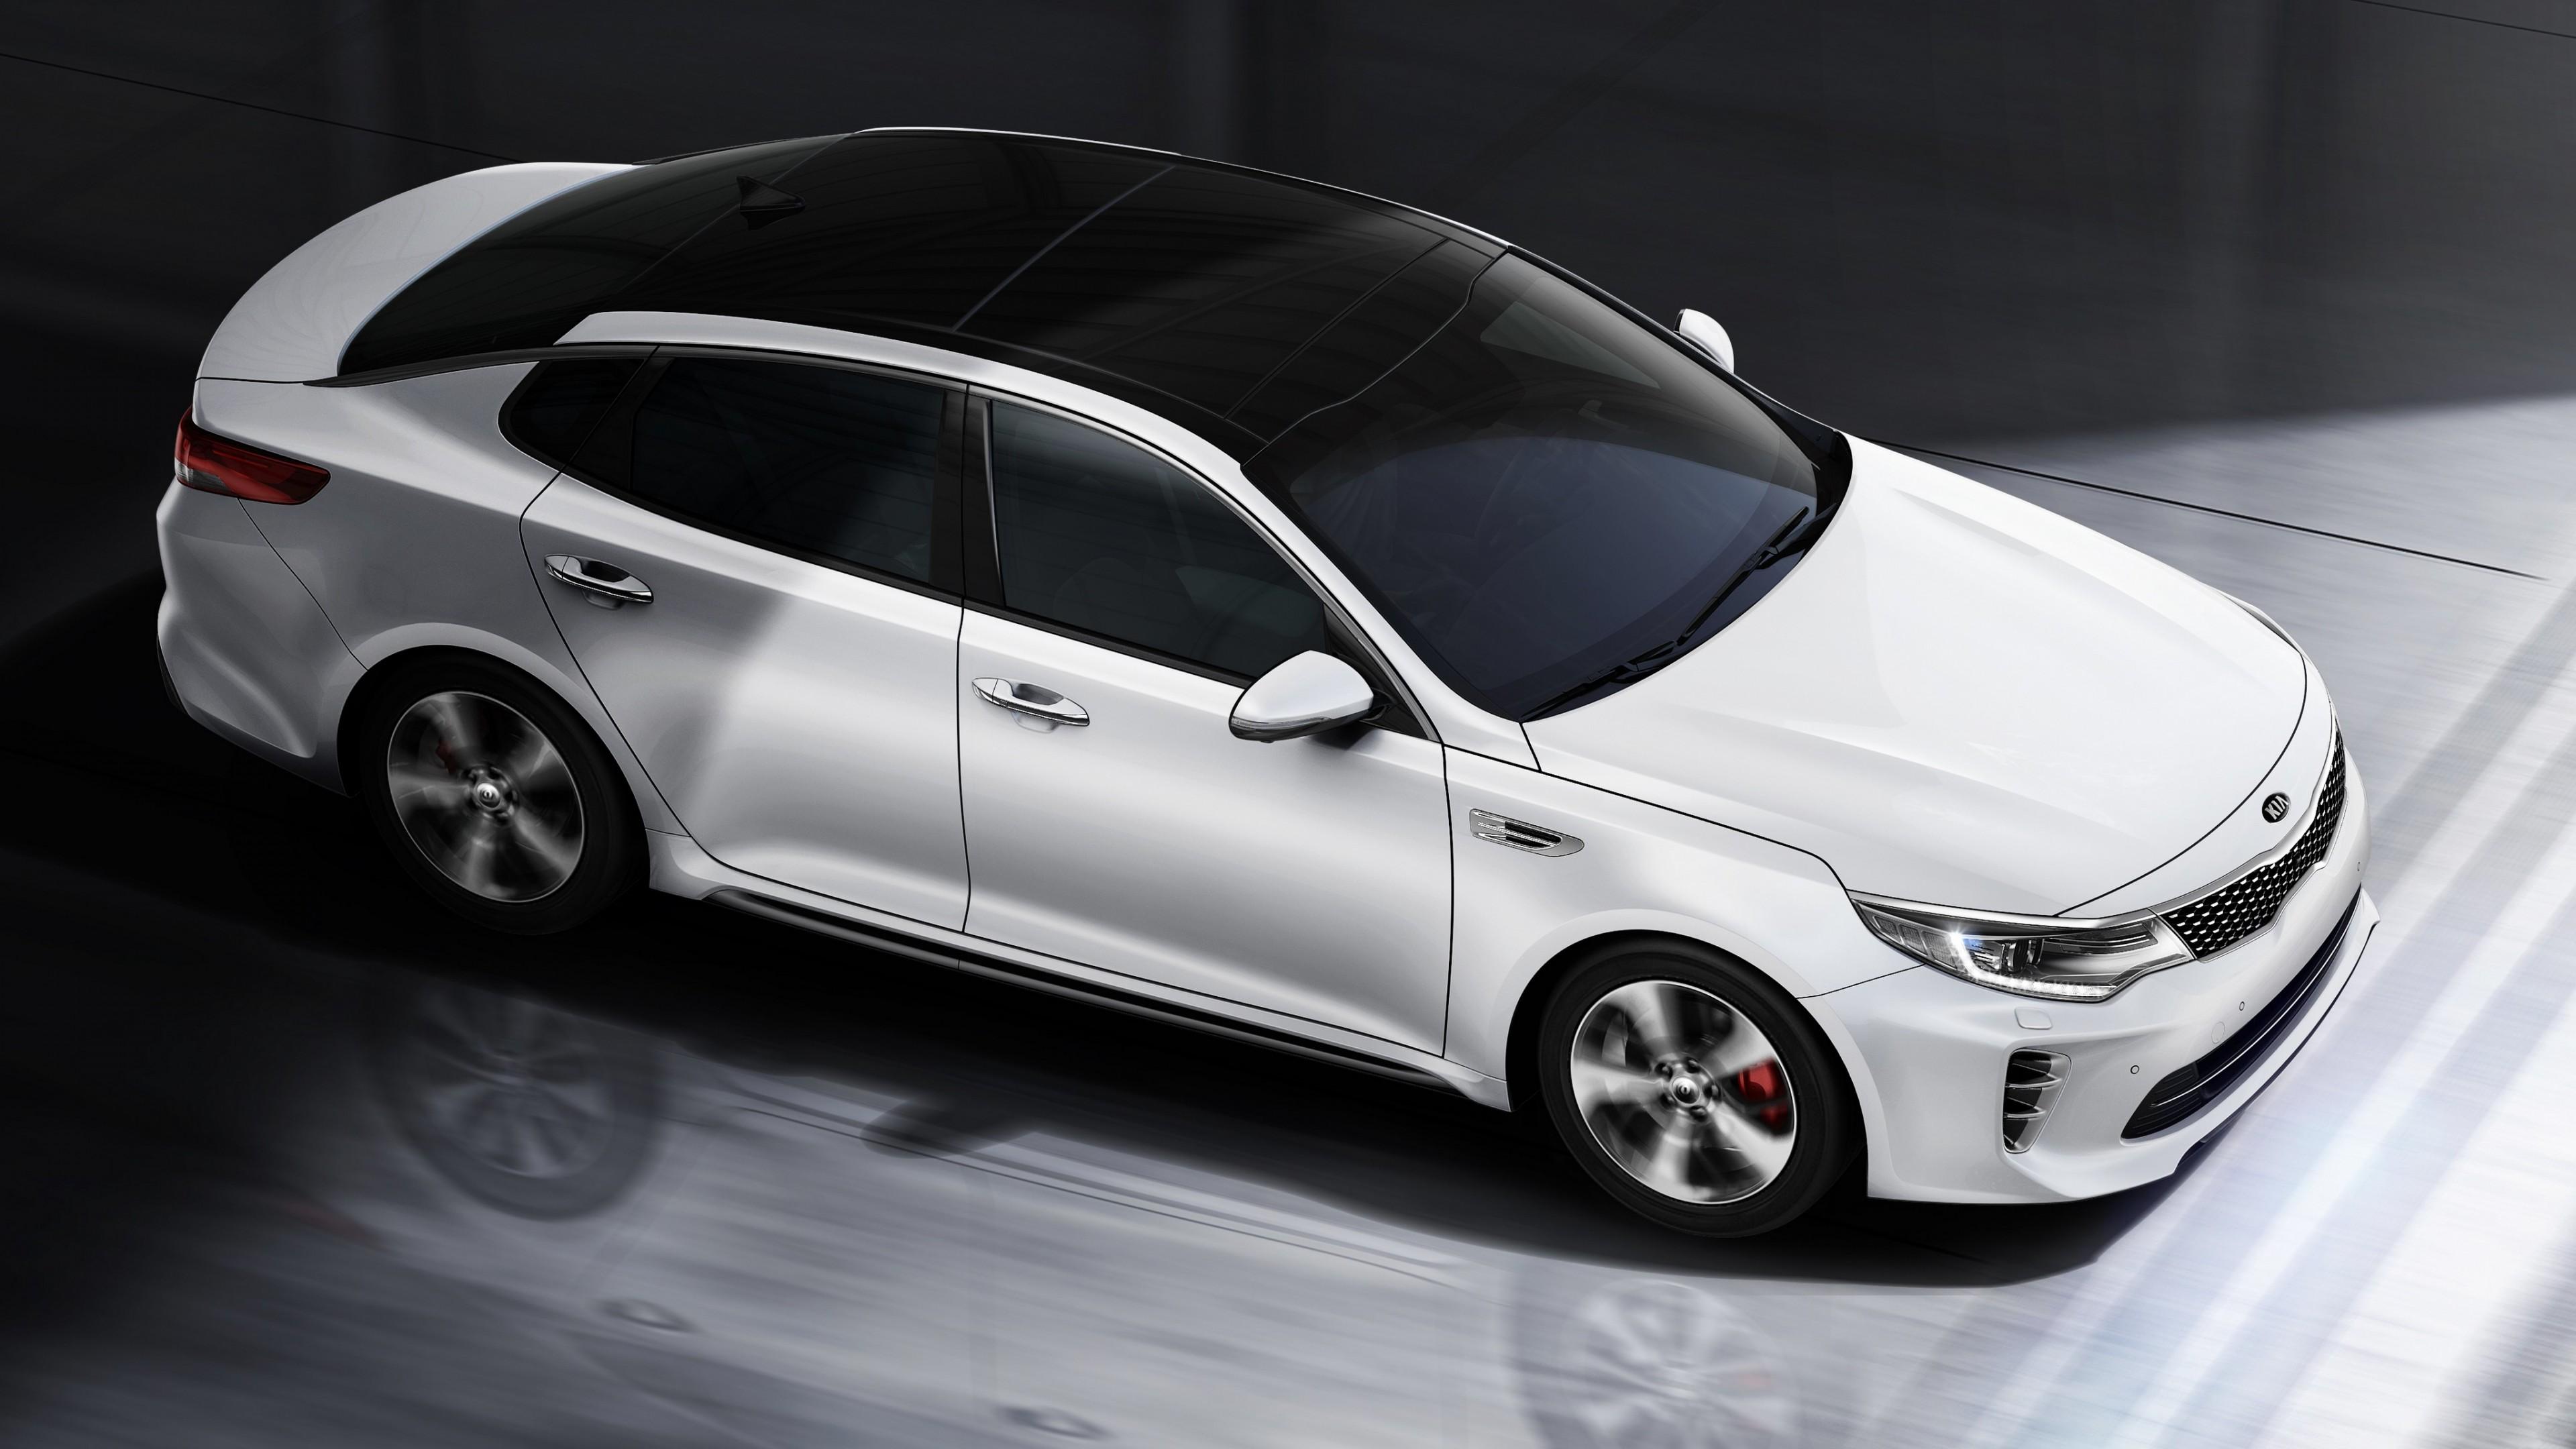 Wallpaper Kia Optima Gt  Supercar  White  Luxury Cars  Sports Car  Test Drive  Cars  U0026 Bikes  7545